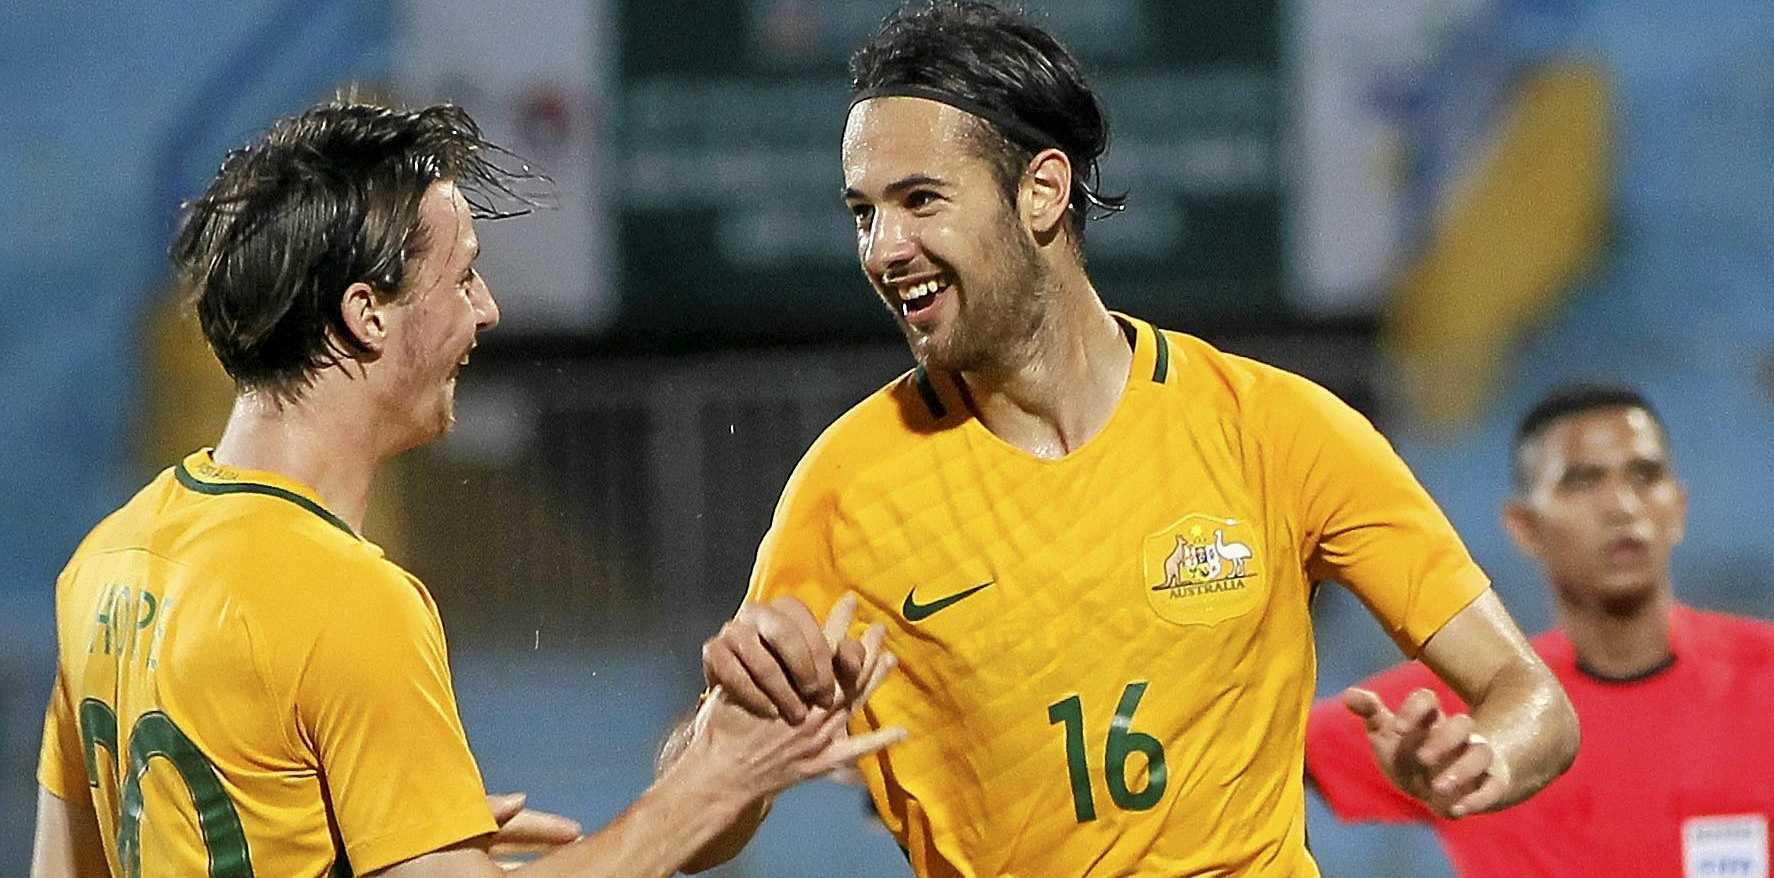 Australian player Steve Kuzmanovski (left) celebrates with Joshua Andrew Hope after scoring against Thailand in Hanoi.